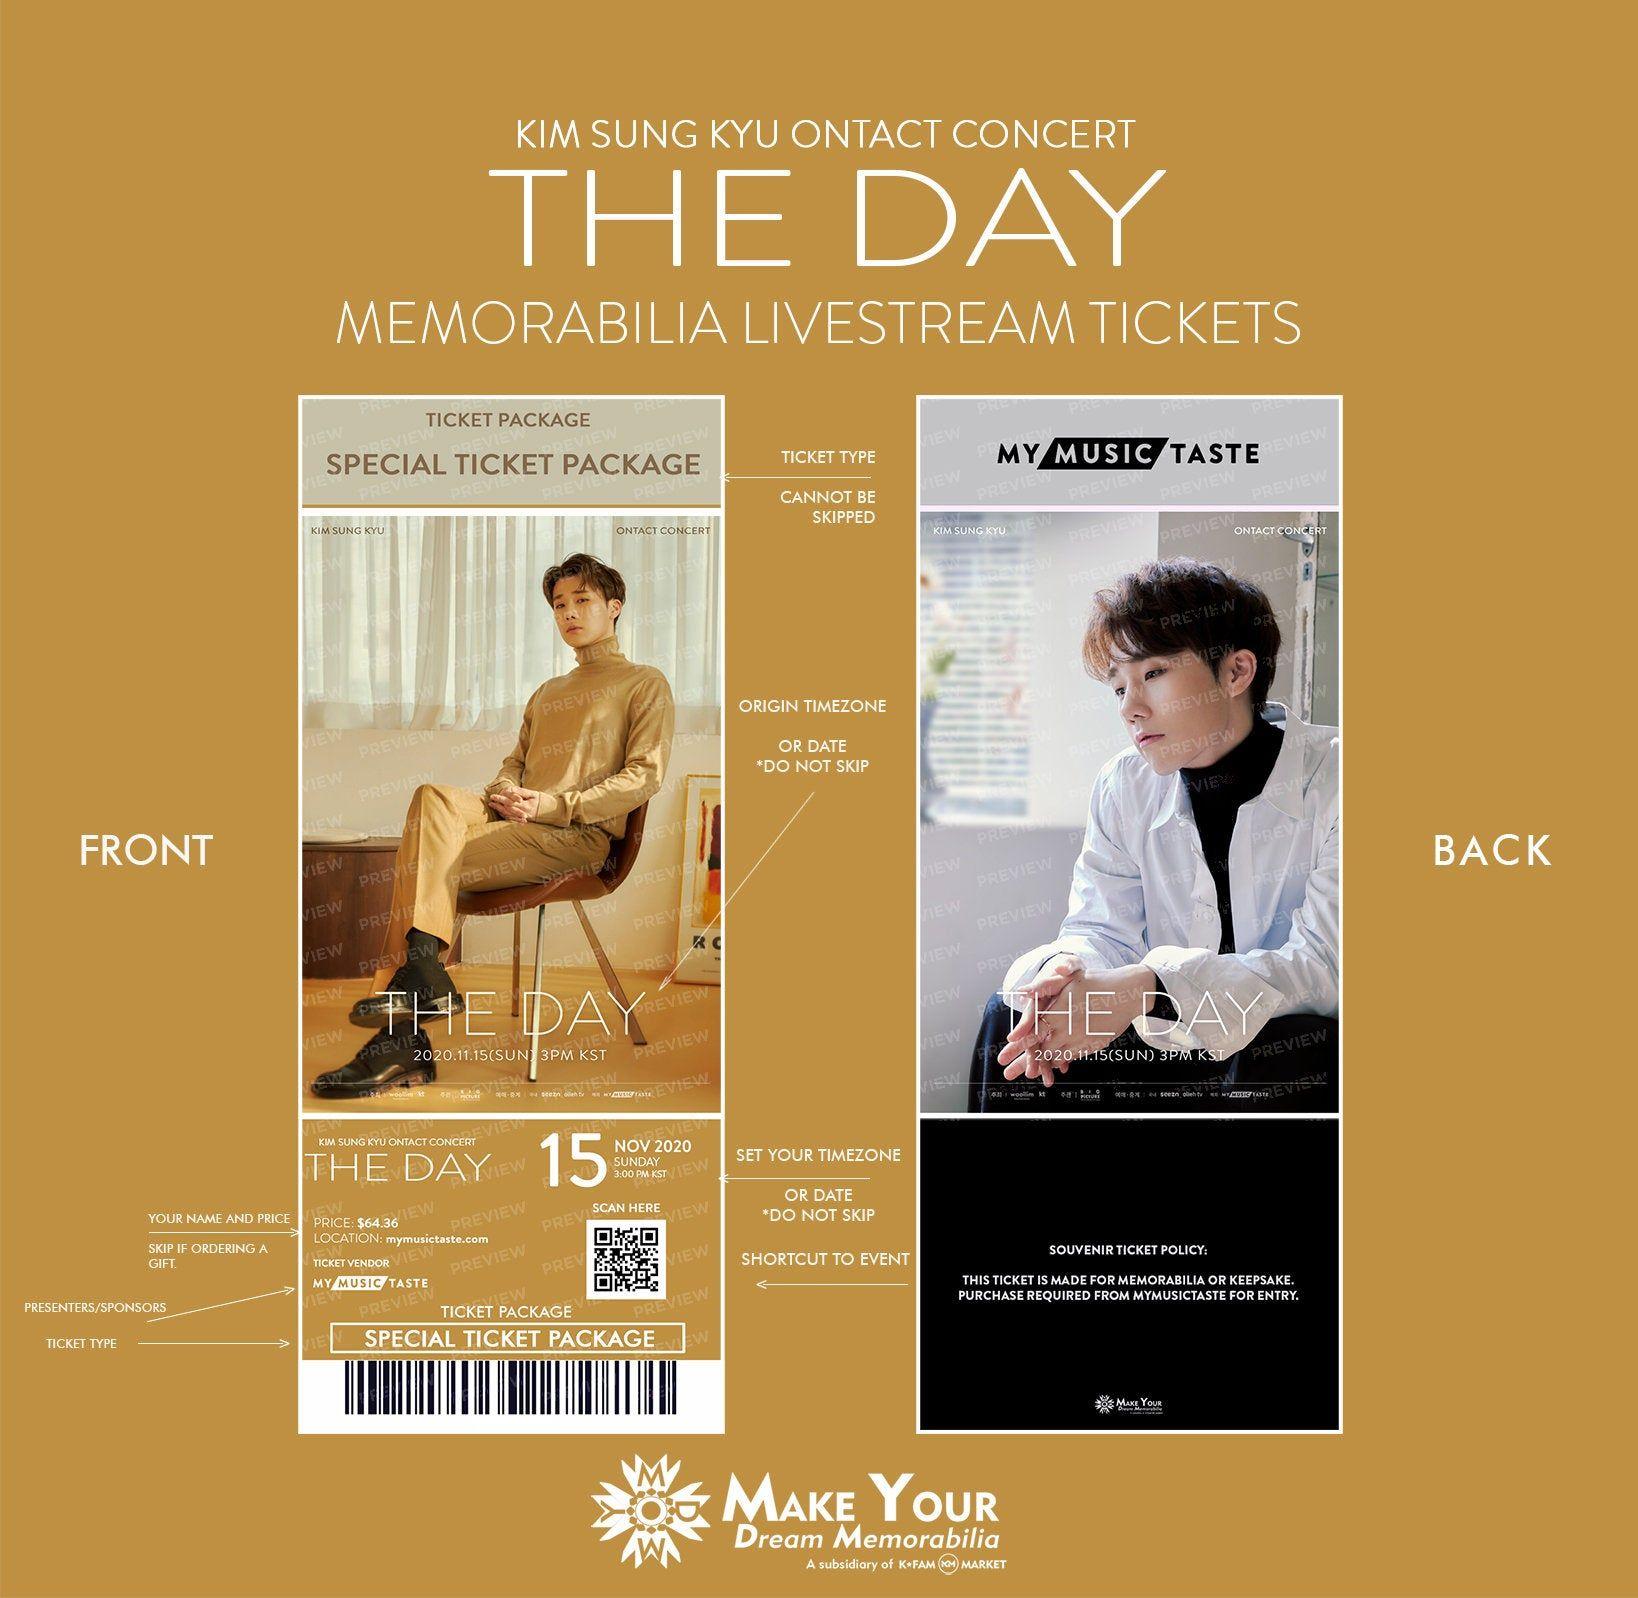 2020 Kim Sung Kyu Online Concert The Day Online Kpop Etsy Kim Sung Kyu Concert Price Tickets